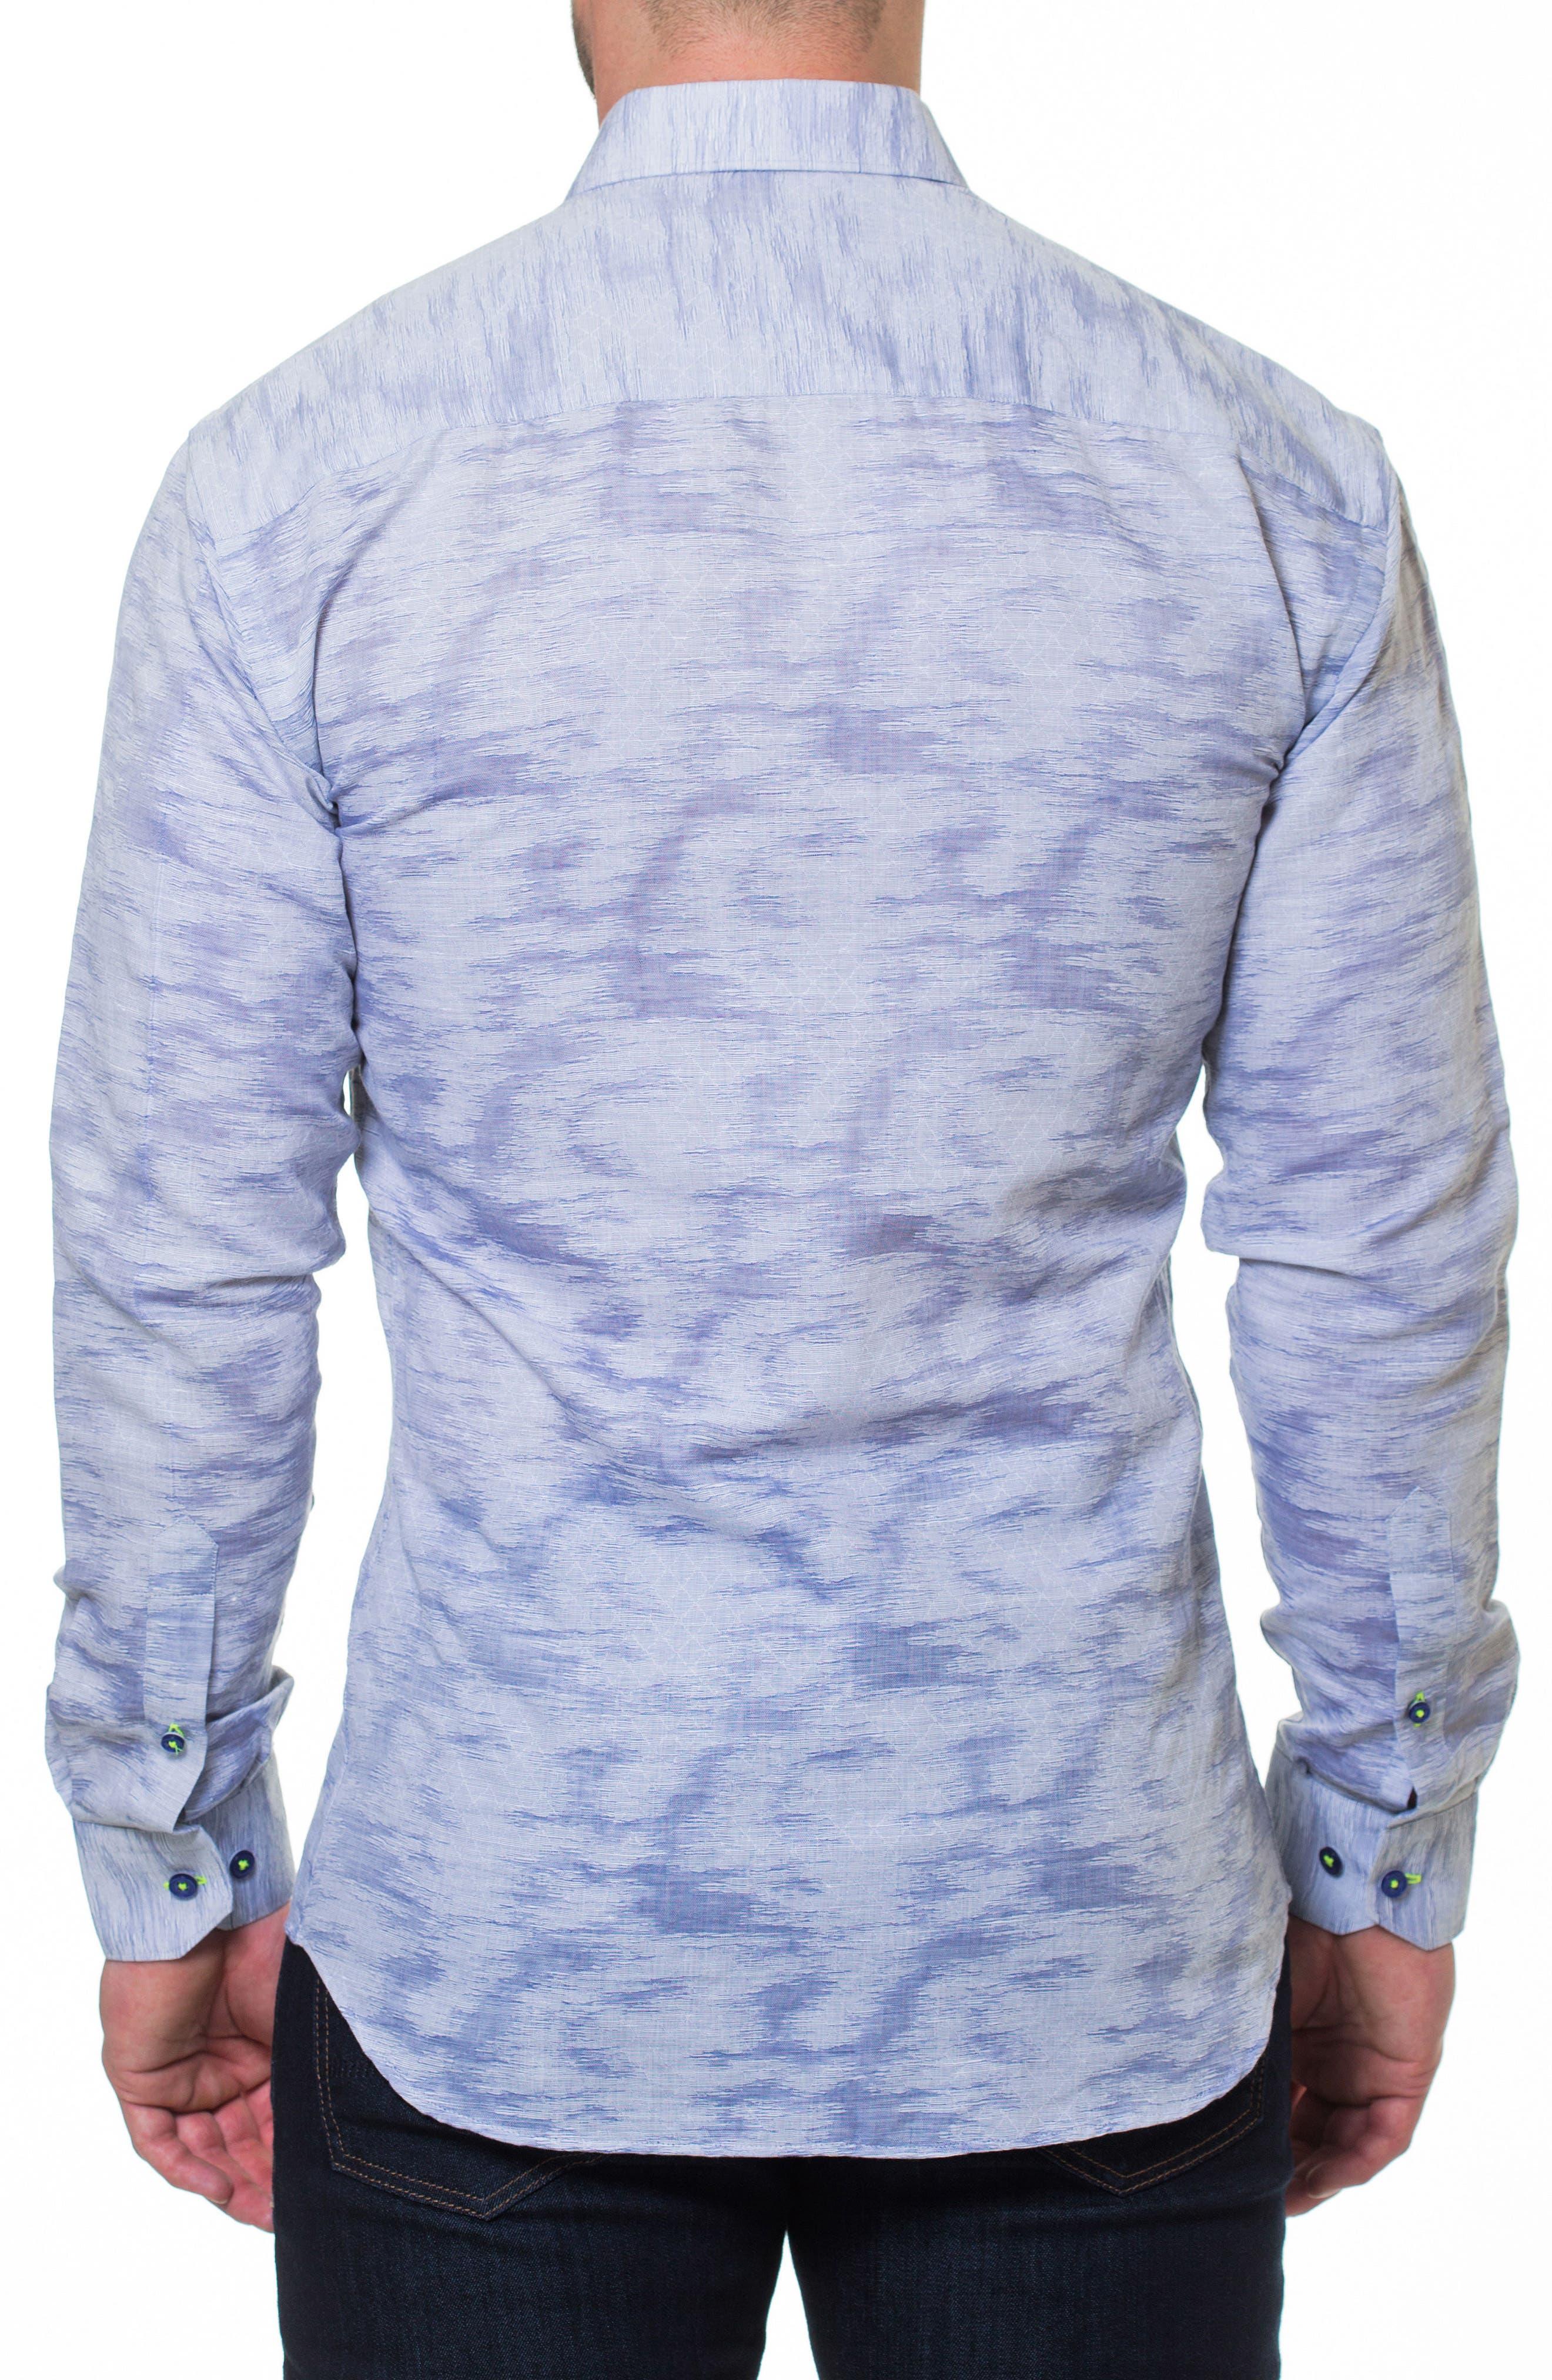 Luxor Richter Slim Fit Sport Shirt,                             Alternate thumbnail 2, color,                             Grey